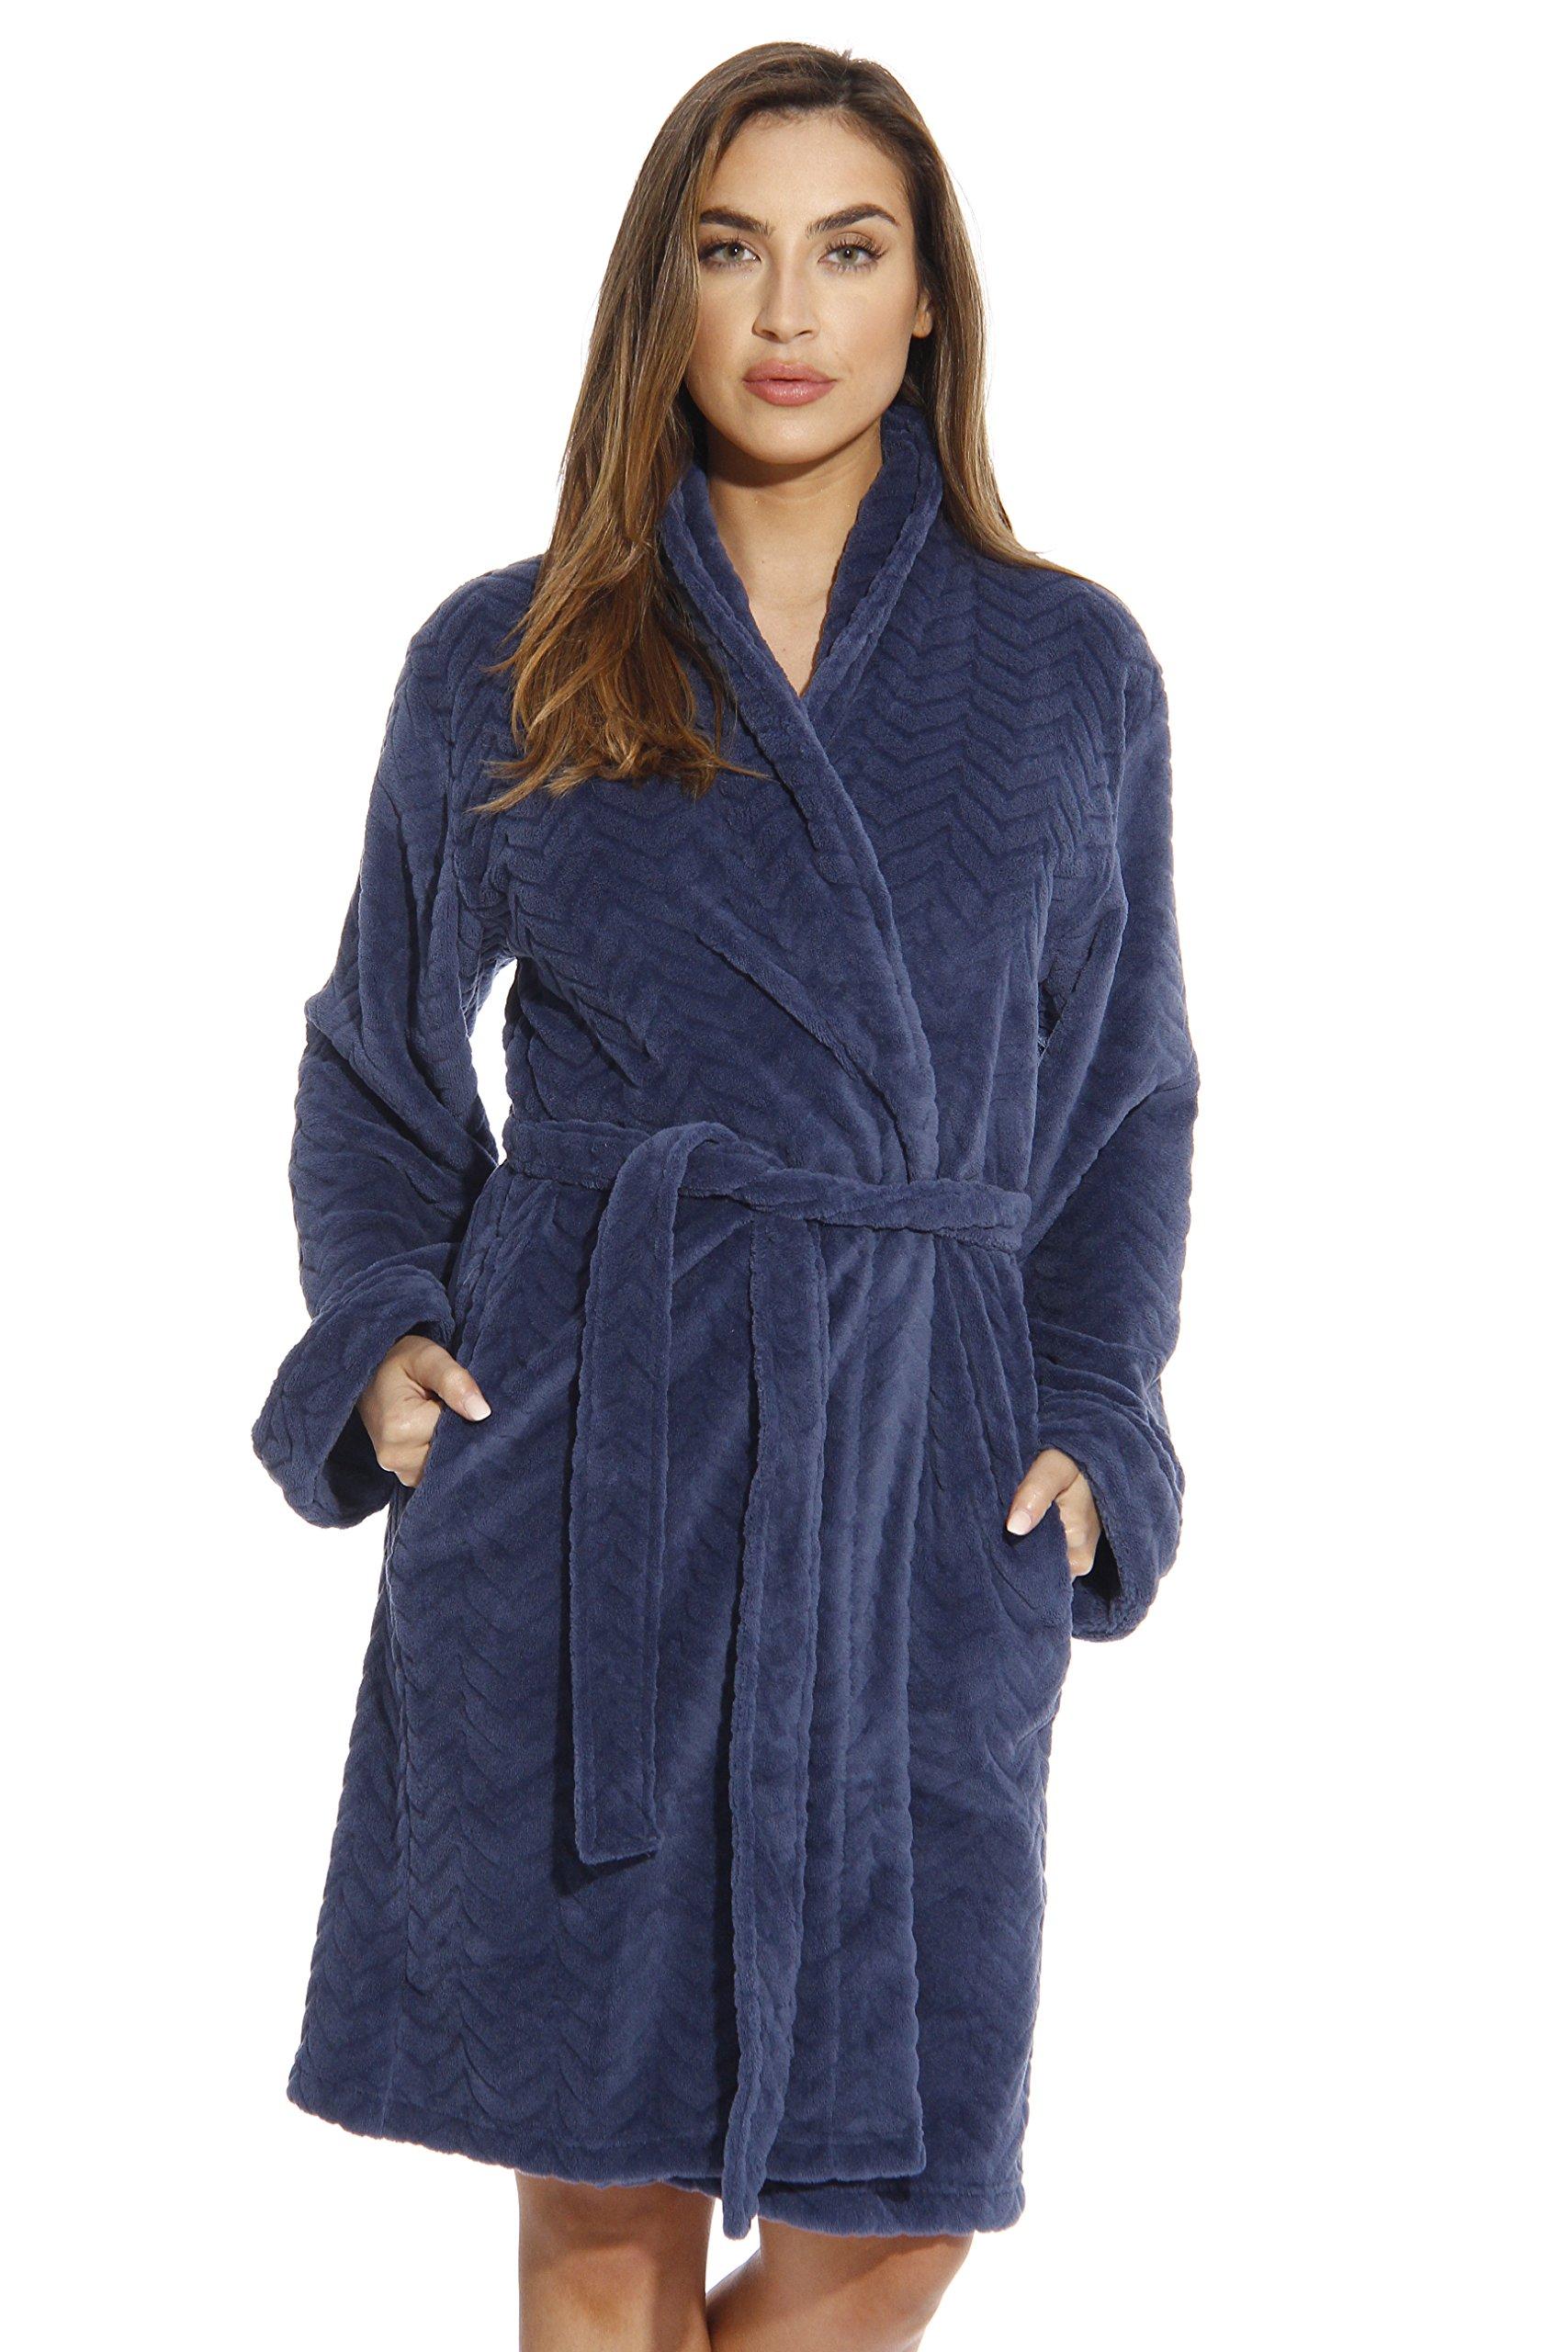 Just Love Kimono Robe Velour Chevron Texture Bath Robes for Women, Navy, Medium by Just Love (Image #1)